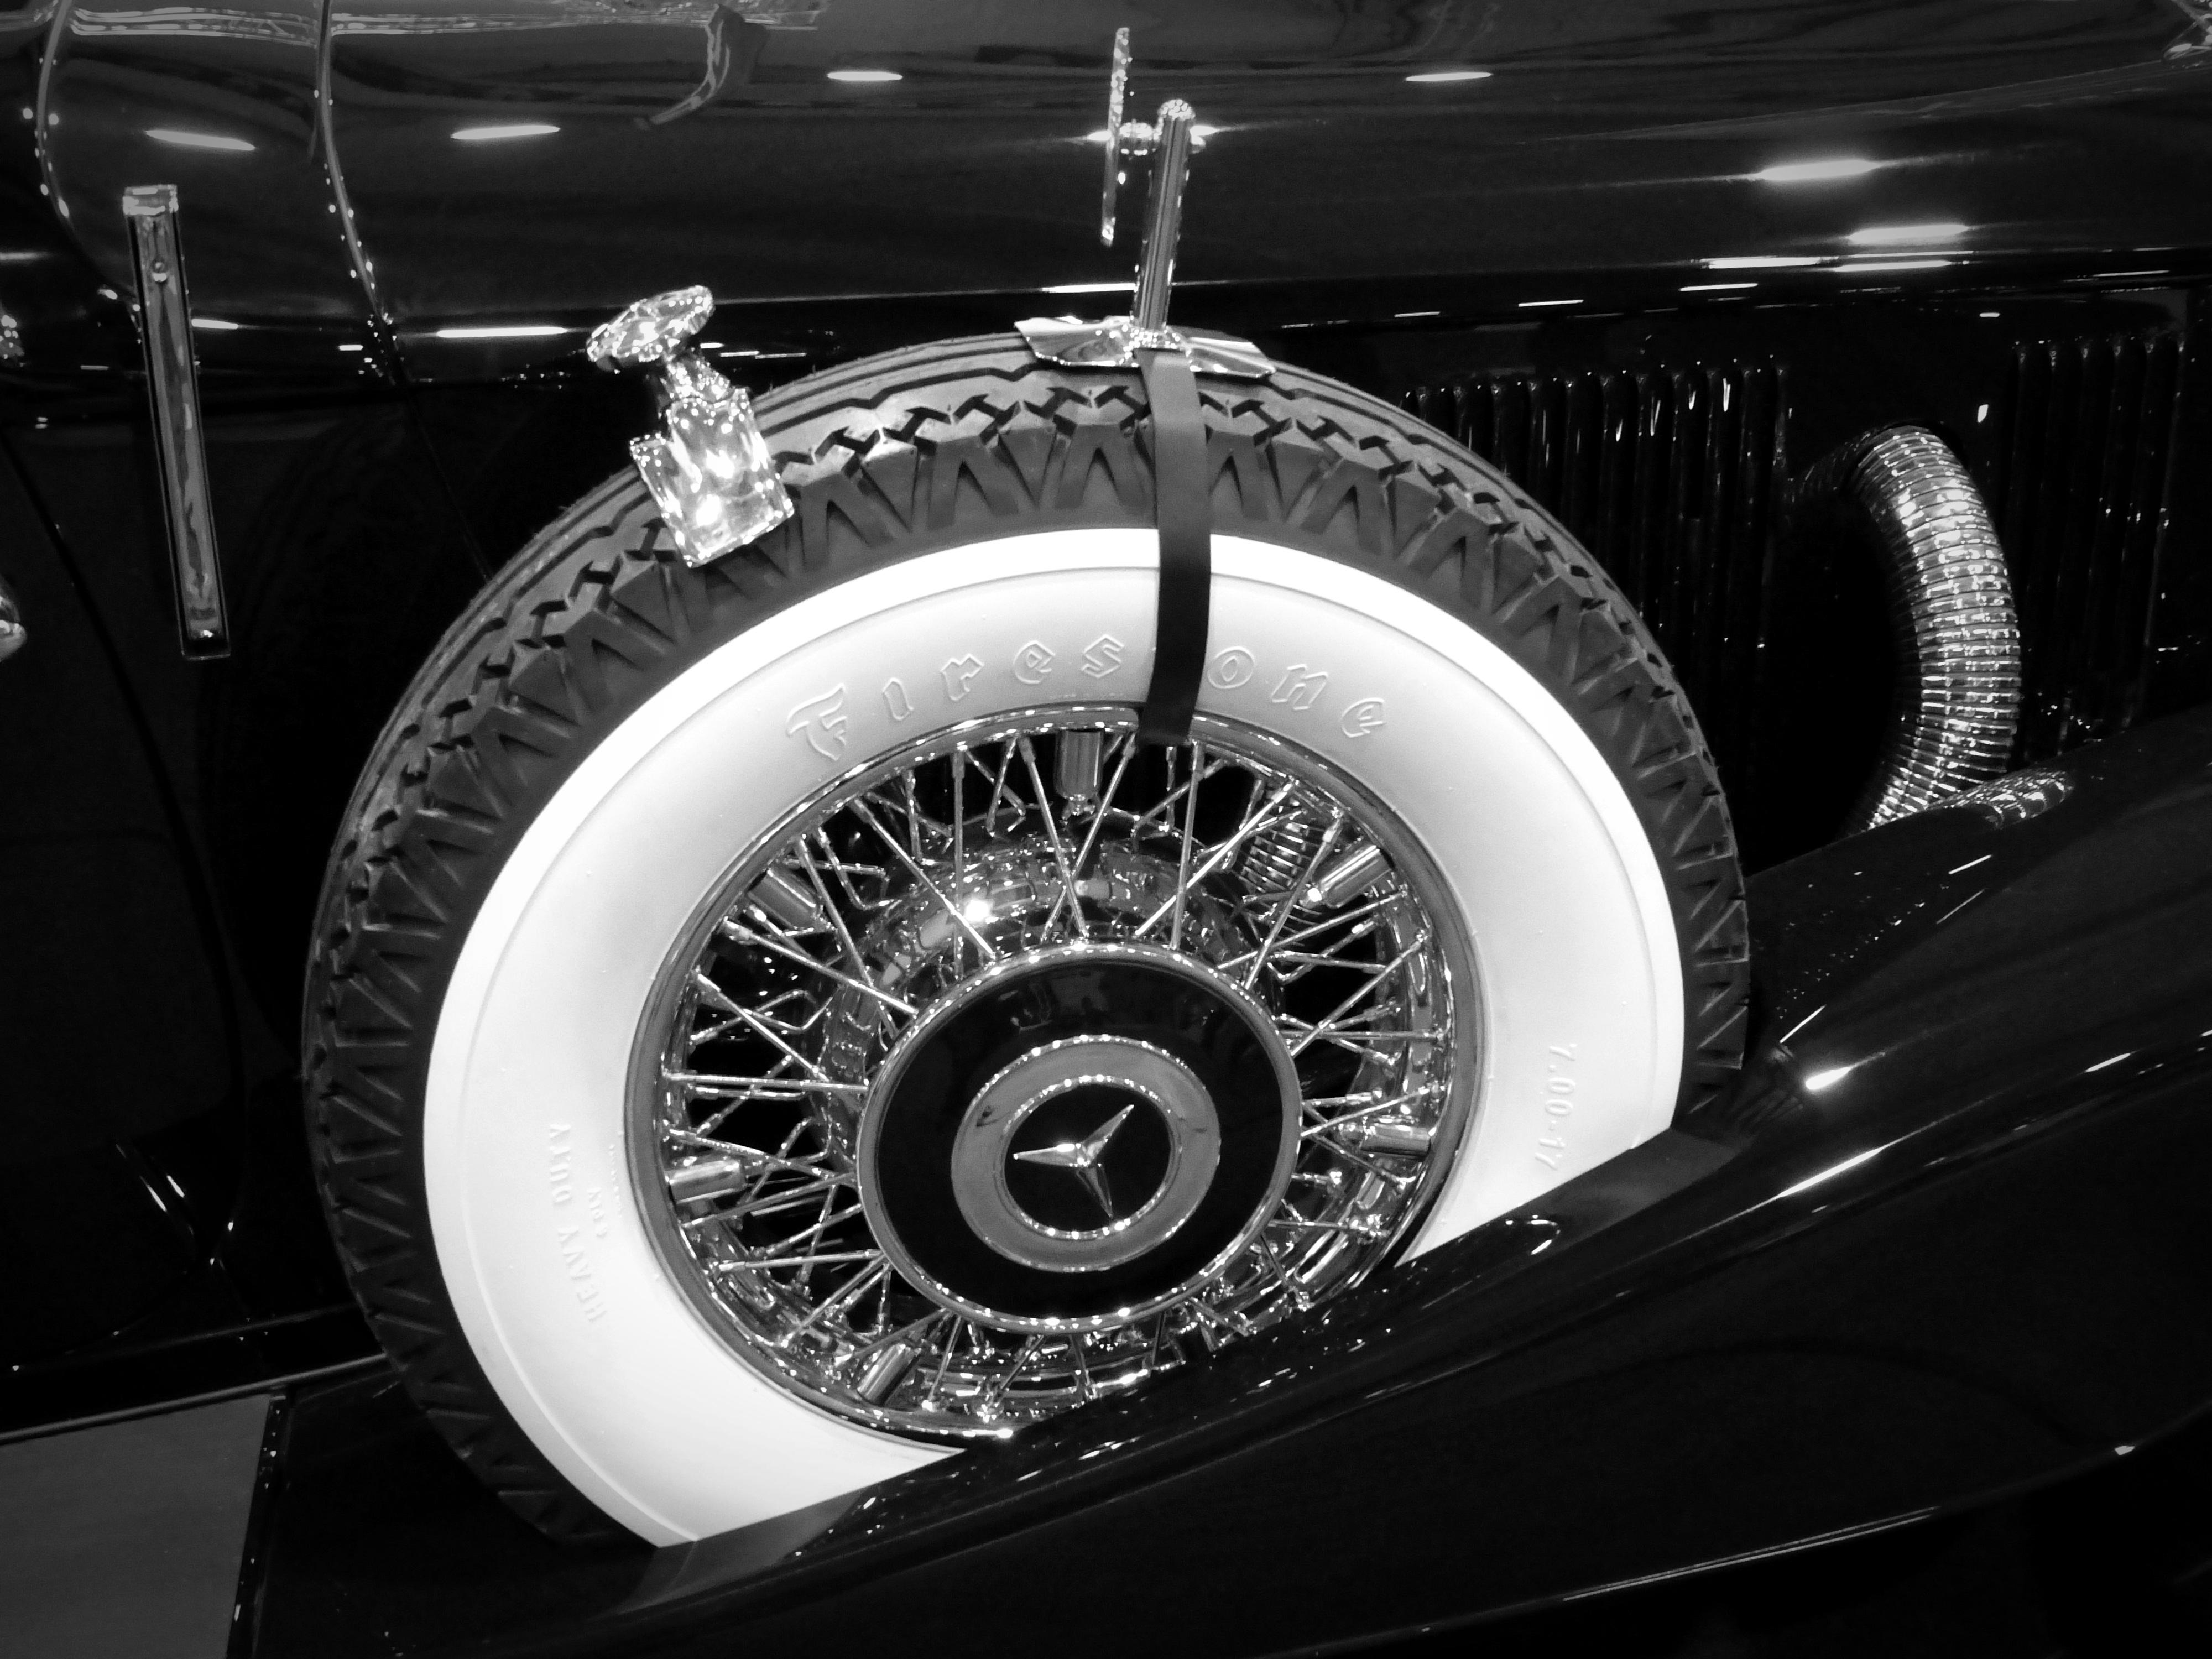 Free Images : black and white, tire, vintage car, rim, oldtimer ...